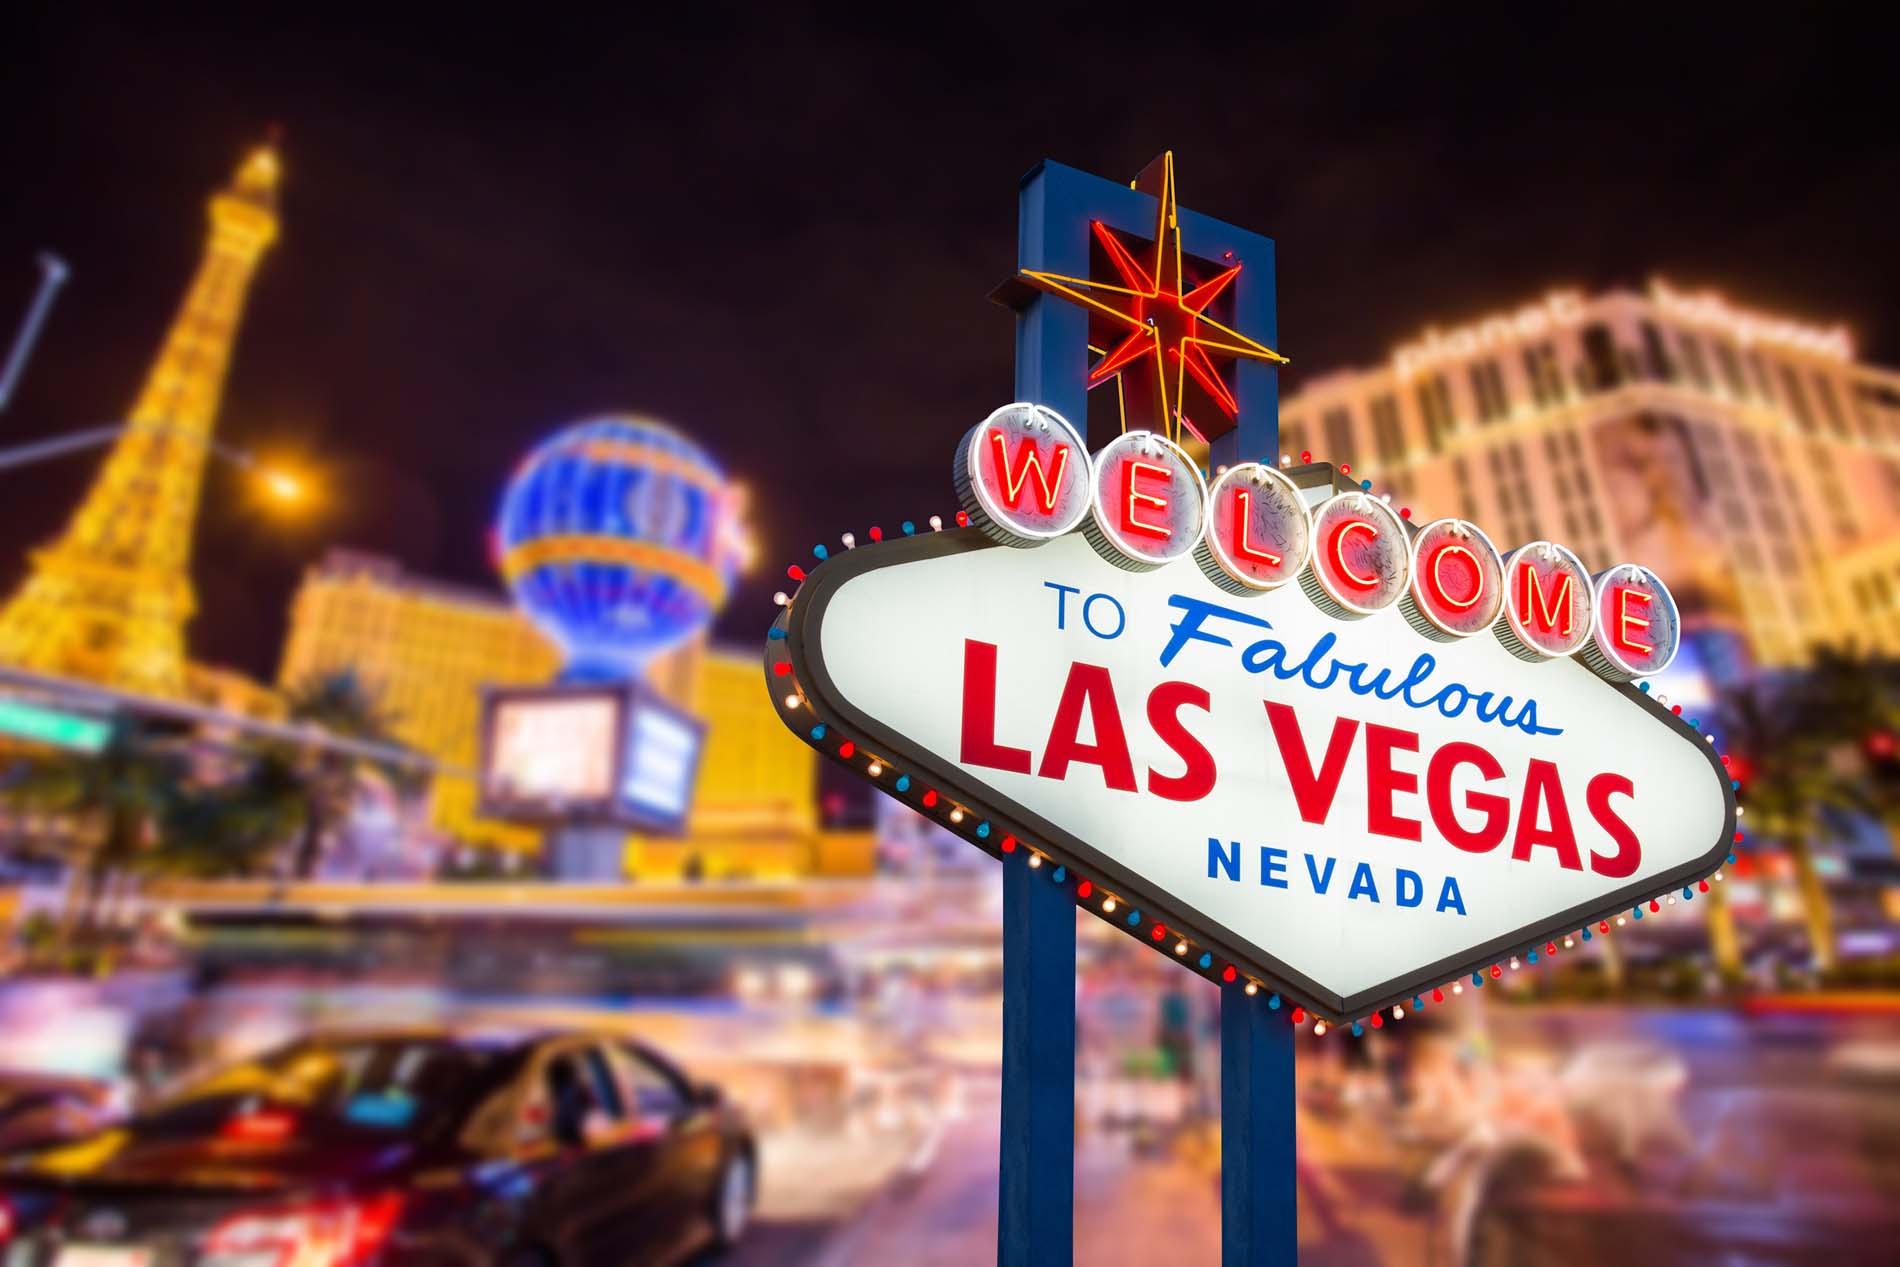 Party Bus Las Vegas | Limo Bus Rentals Las Vegas - Crown LV